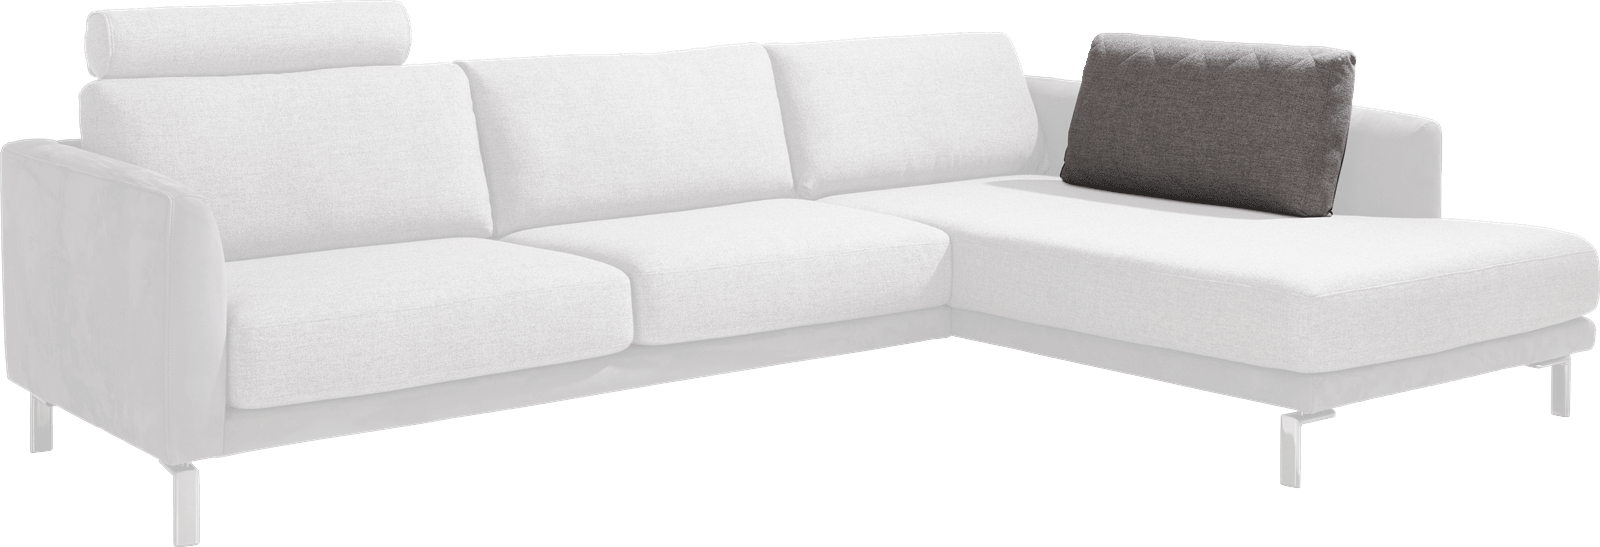 Vigo - ruckenkissen fuer longchair - 60 cm